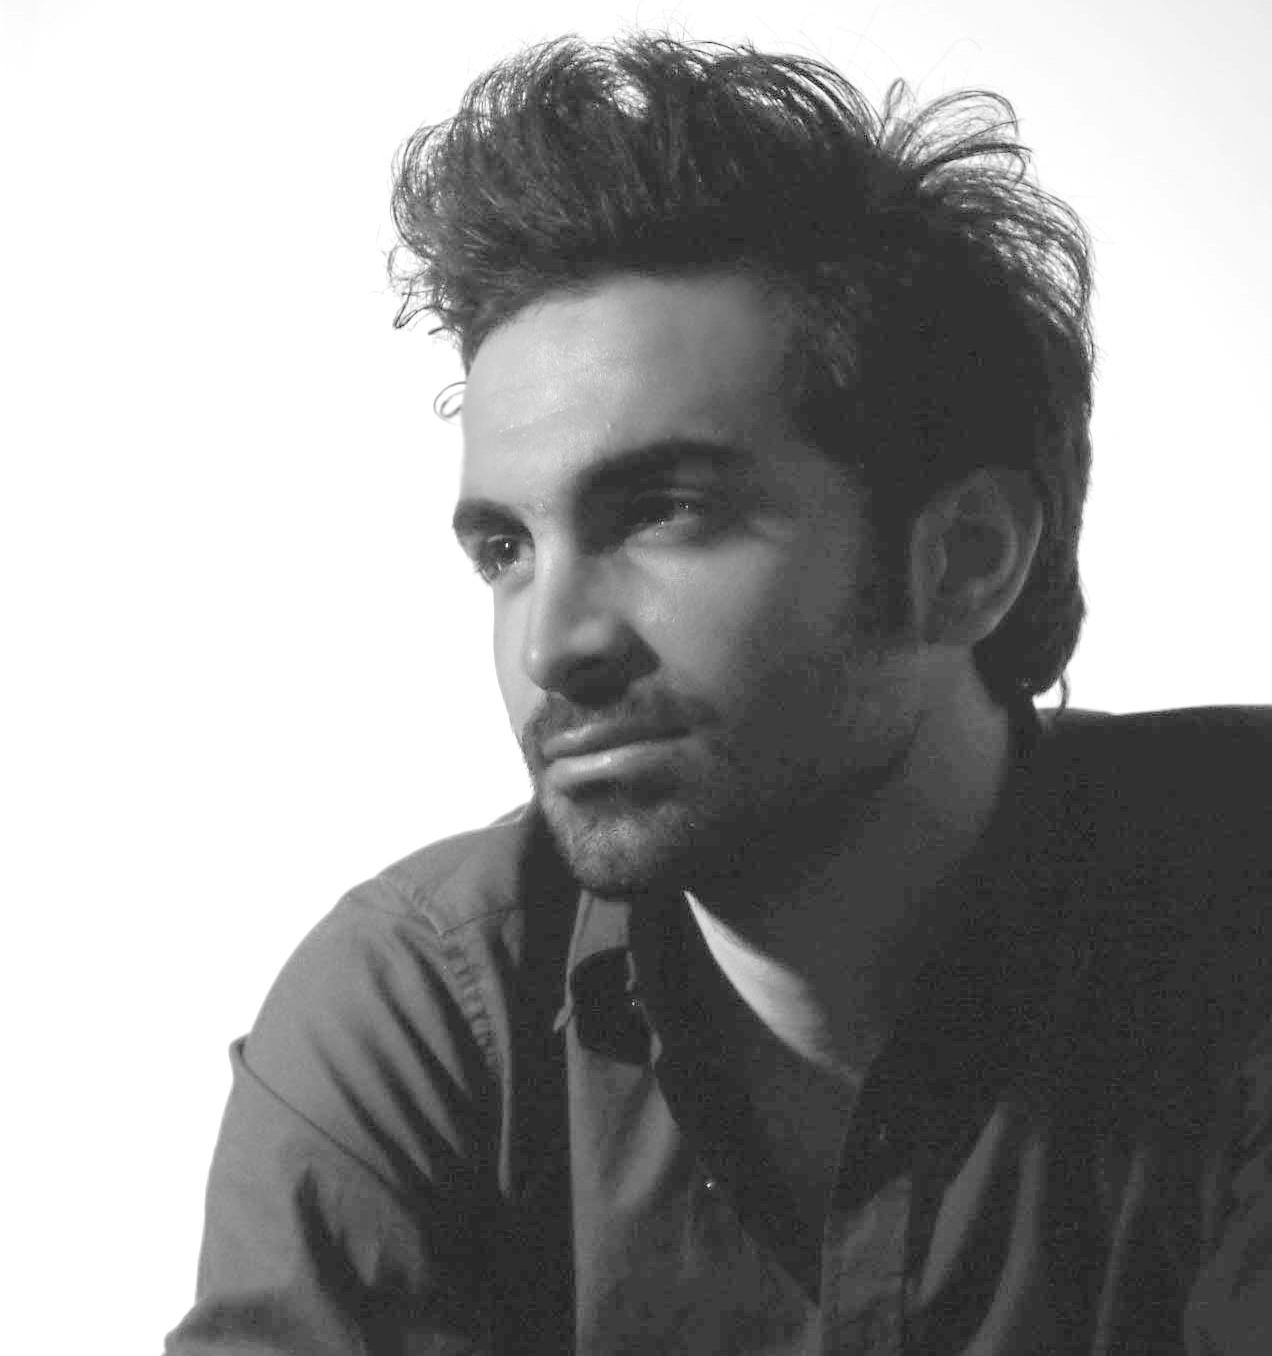 Black & White Headshot of Bahman Mohammadi